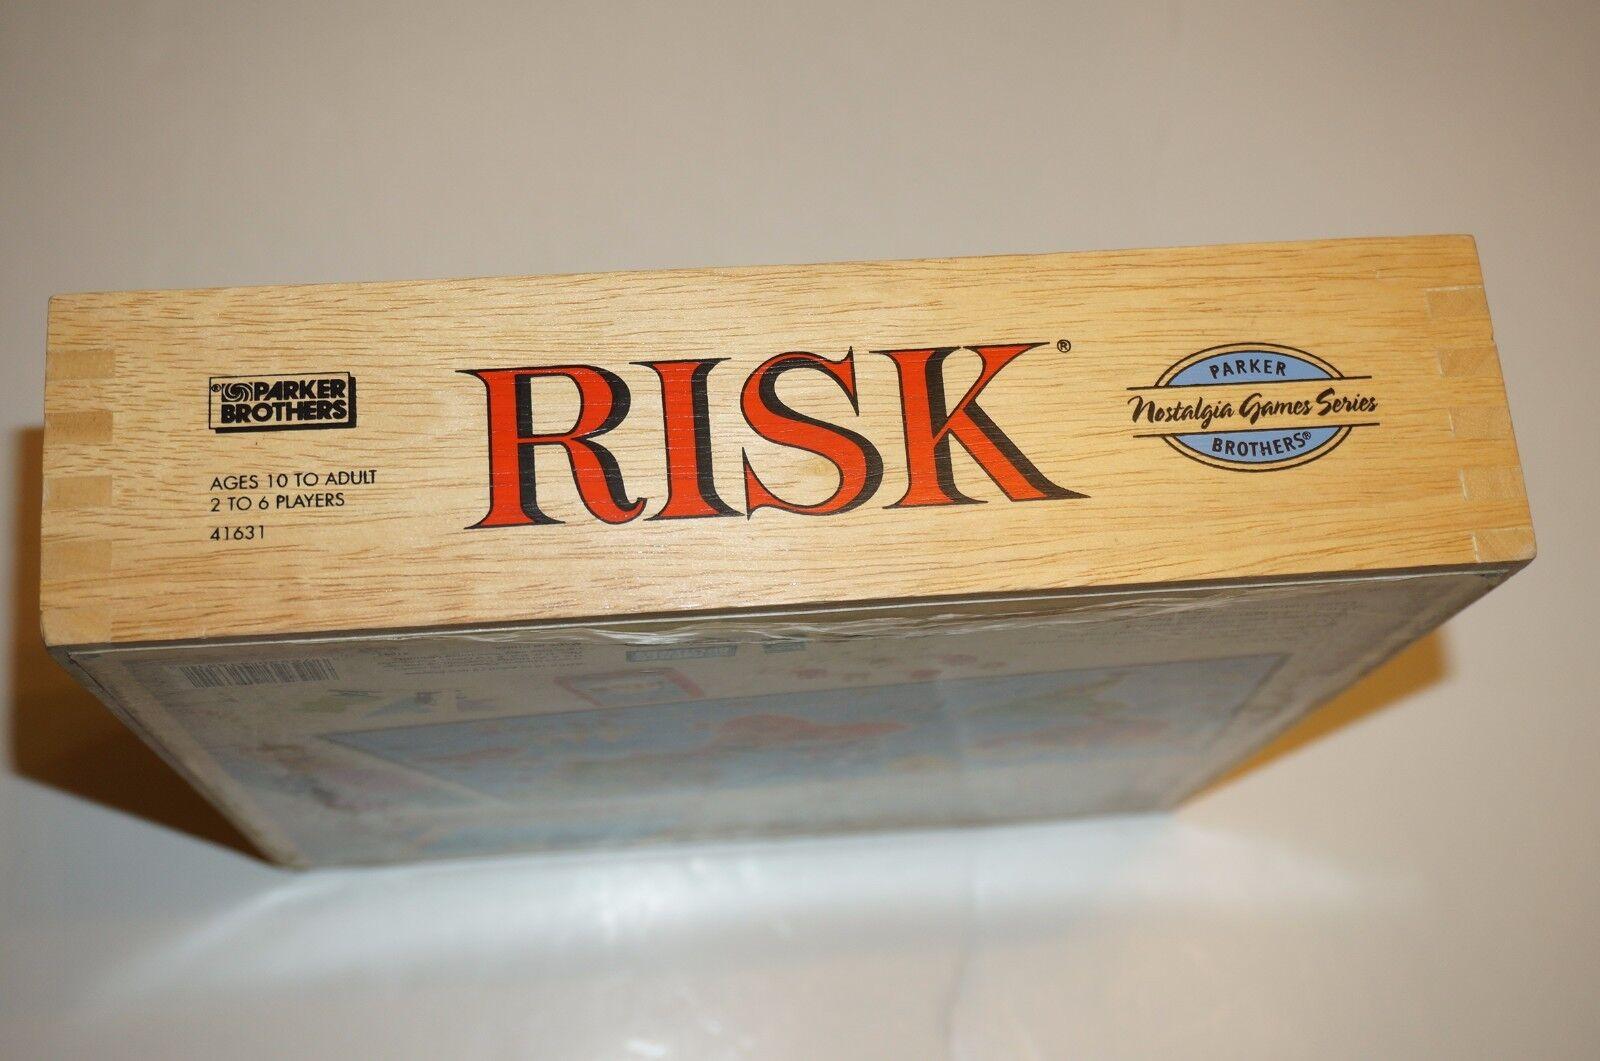 Risk Nostalgia Game Series Bookshelf 2003 Hasbro WOODEN Pieces in in in Wood box ca956c